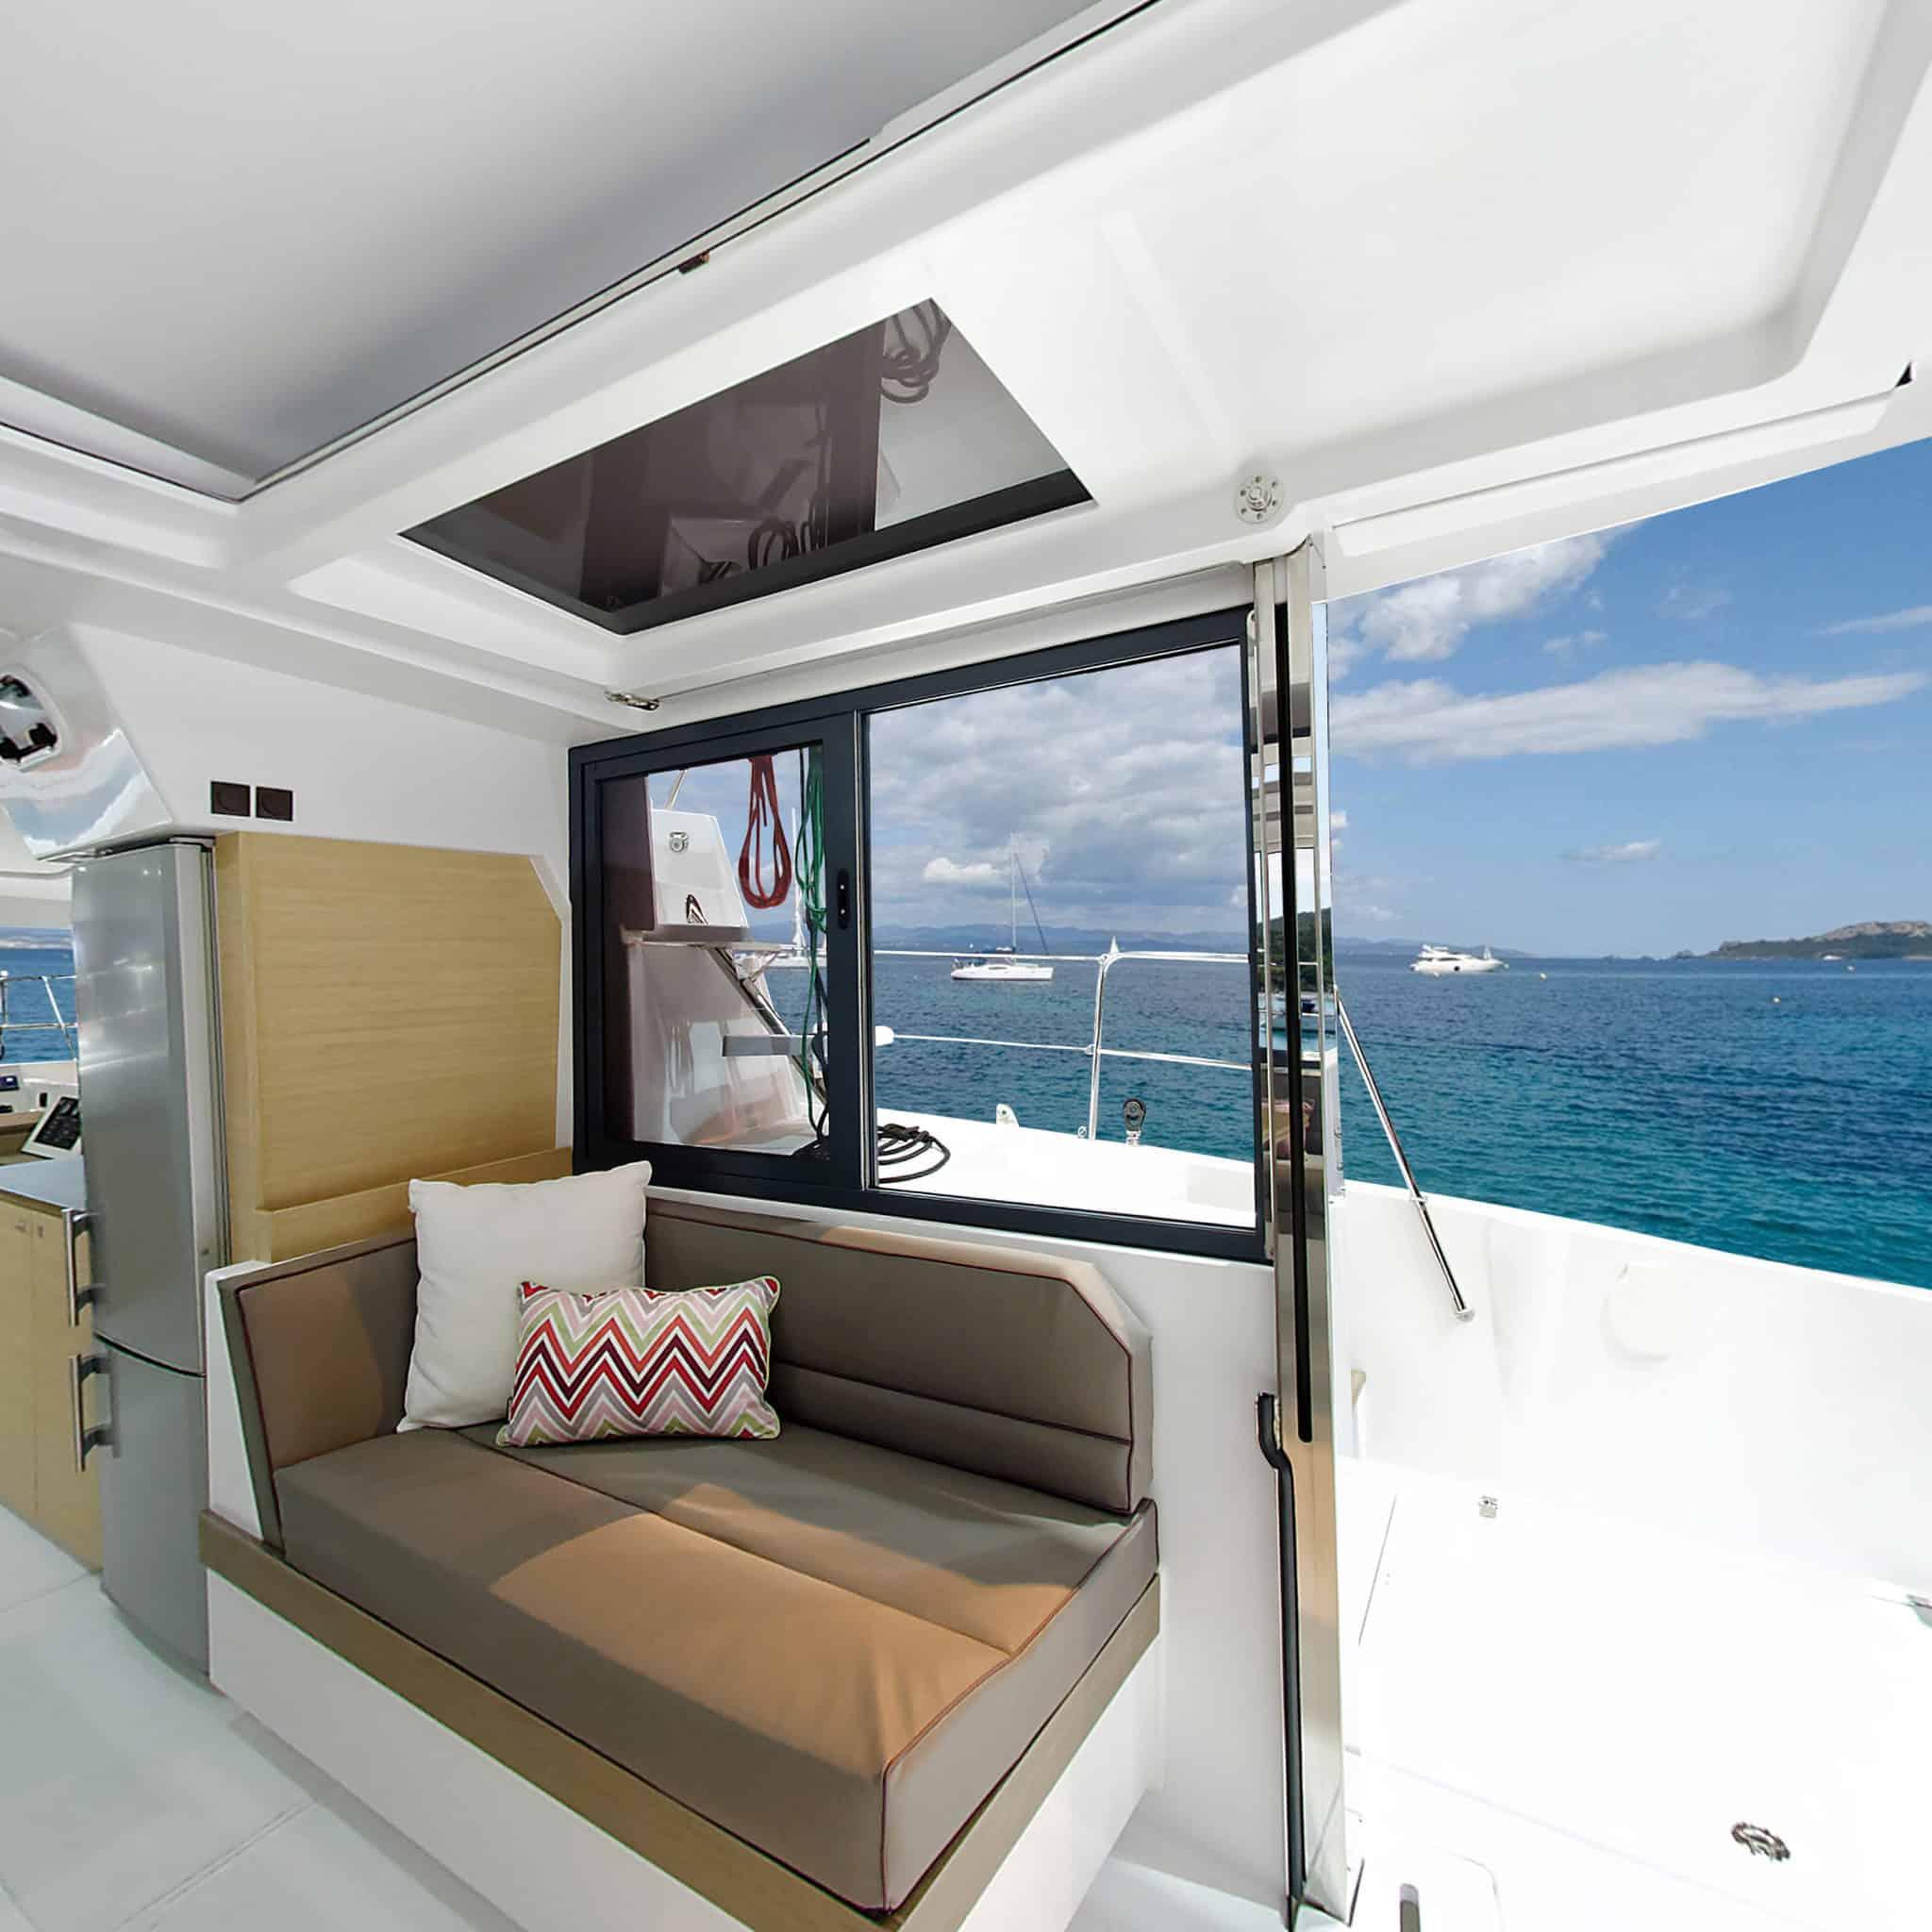 bali 4,0-yacht-charter-croatia-sailing-holidays-croatia-booking-yacht-charter-croatia-catamarans-sailboats-motorboats-gulets-luxury-yachts-boat-rental-croatia